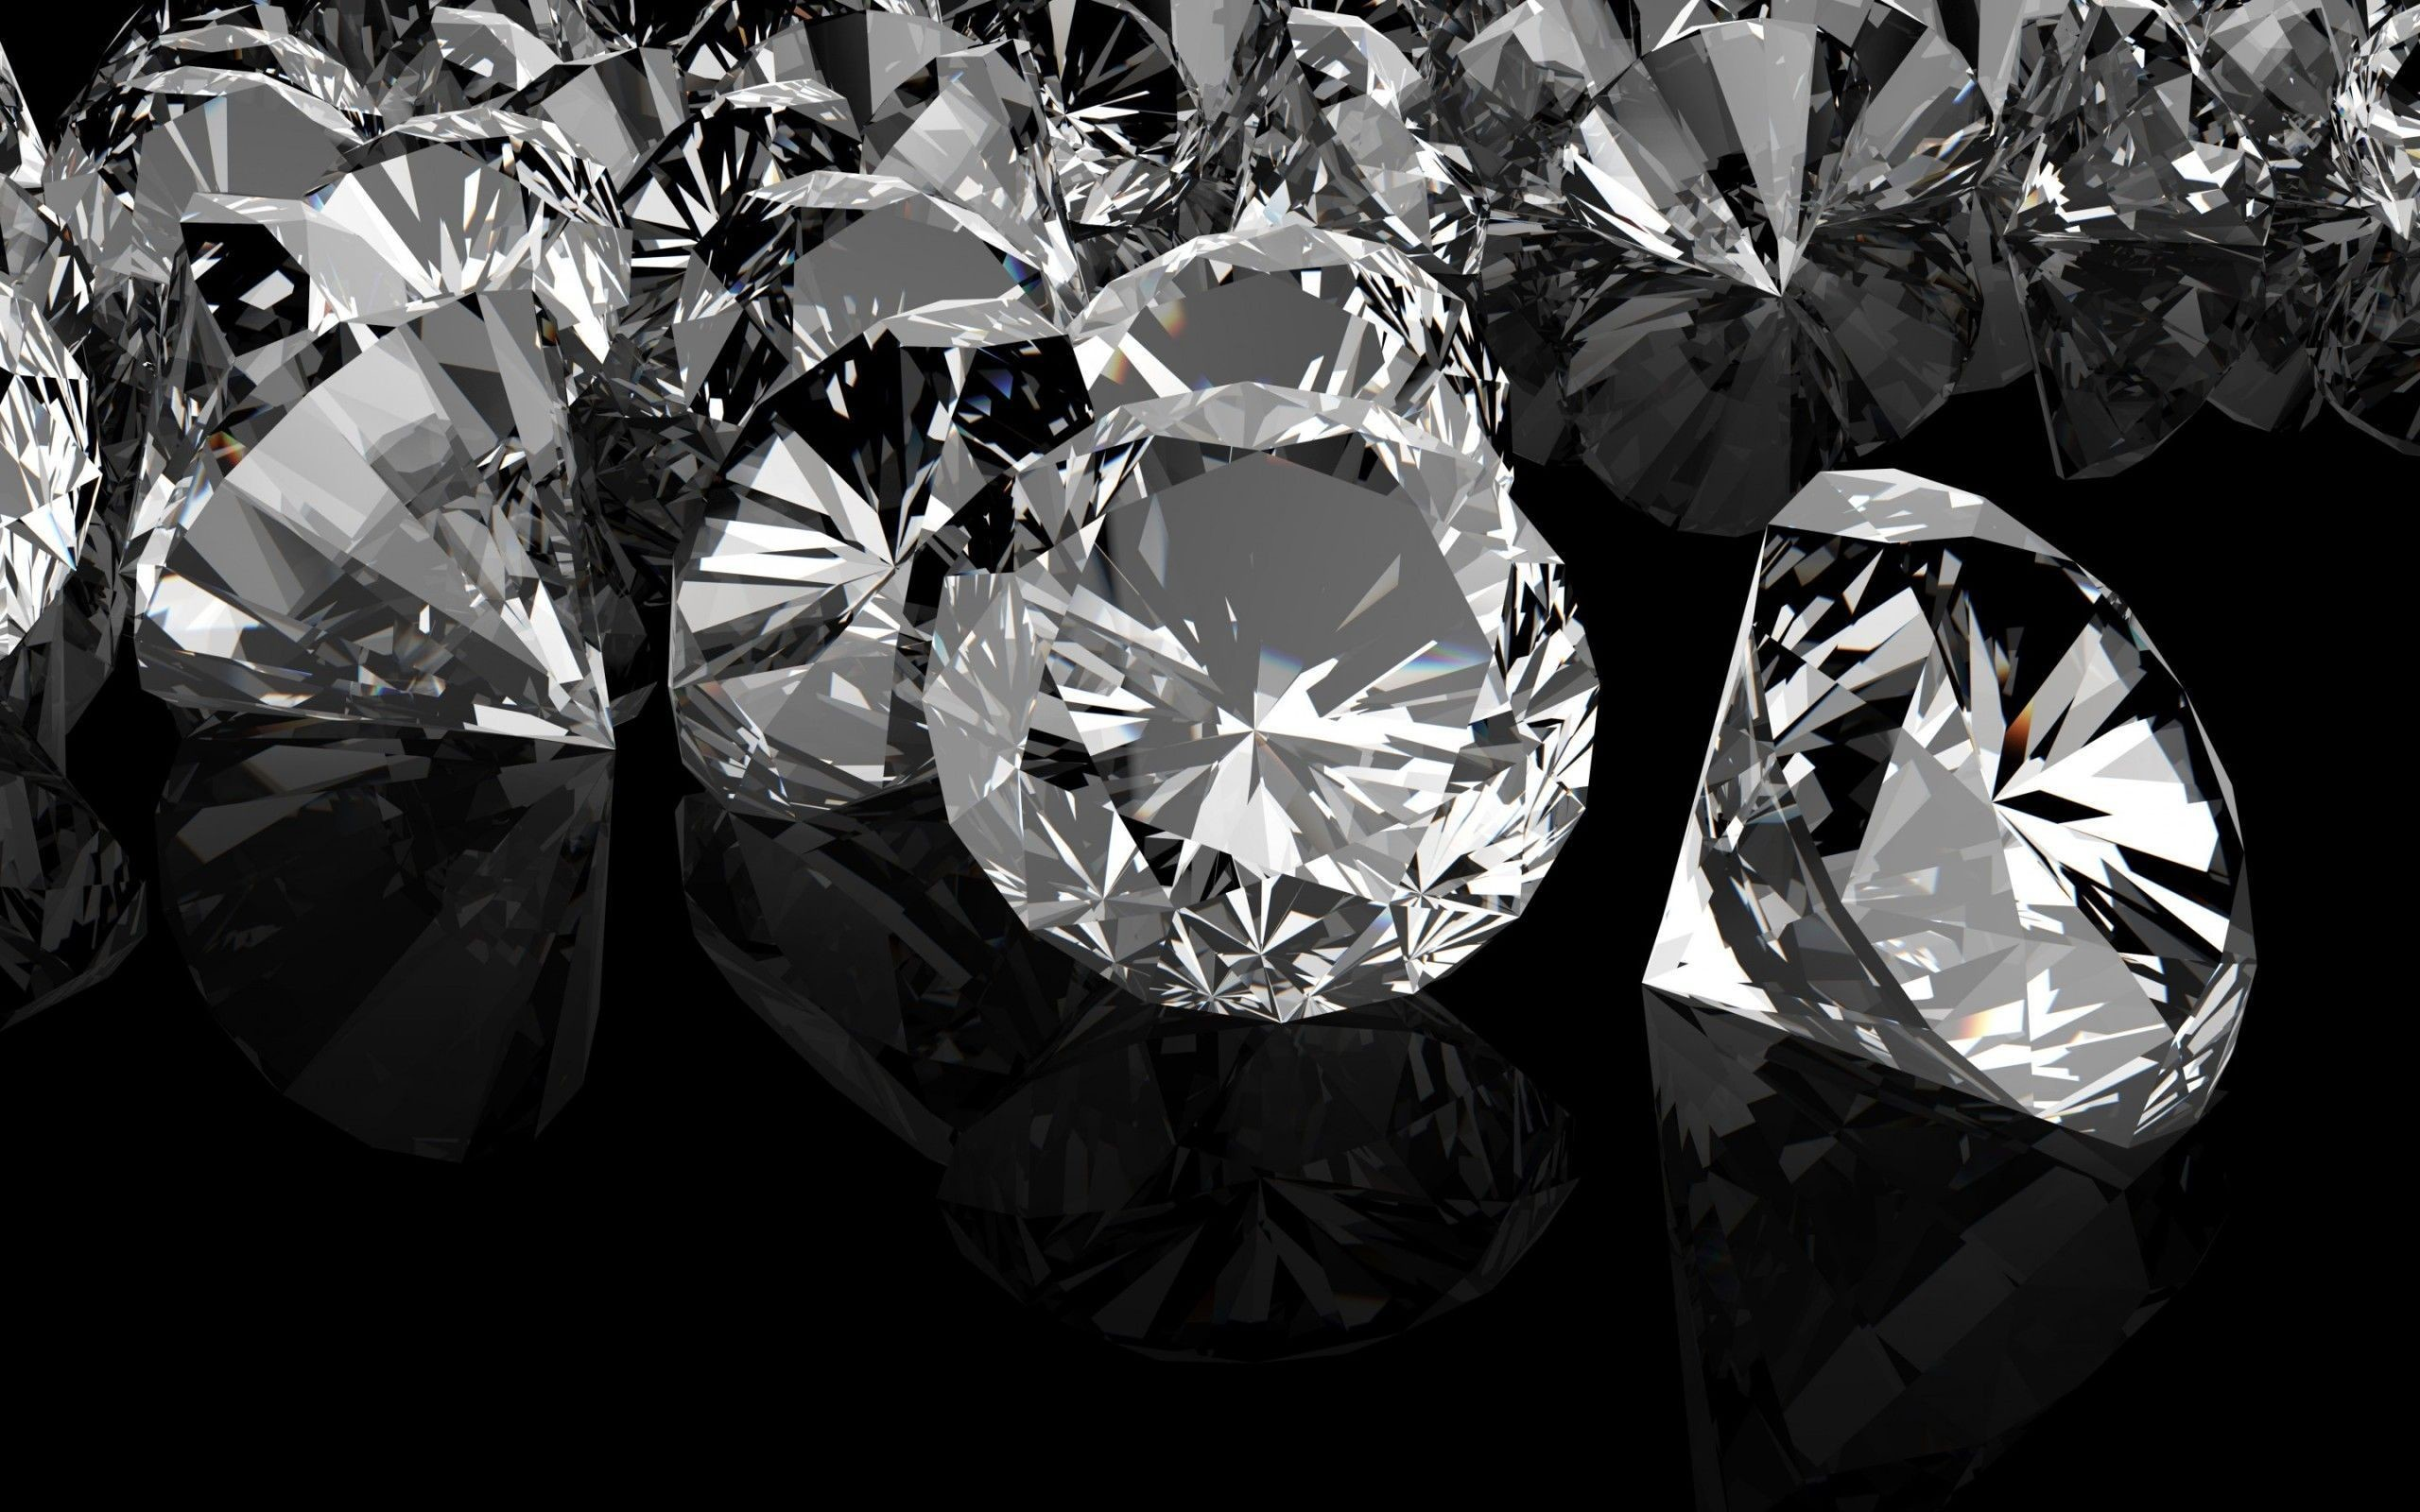 Res: 2560x1600, Black Diamond Wallpaper HD.